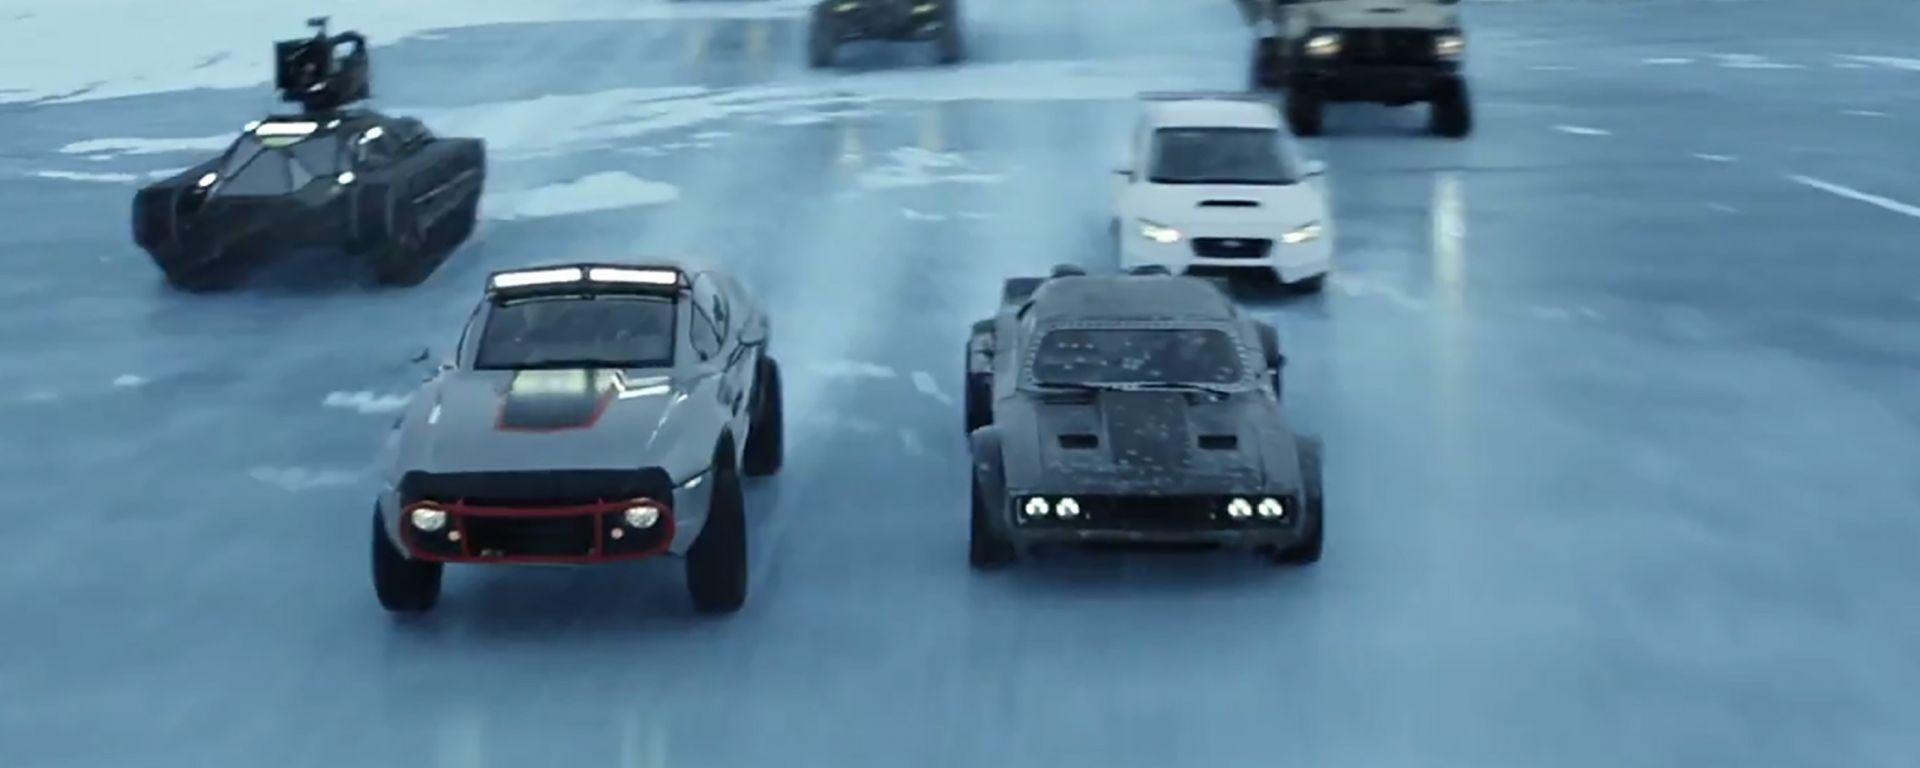 Fast & Furious 8: il nuovo trailer